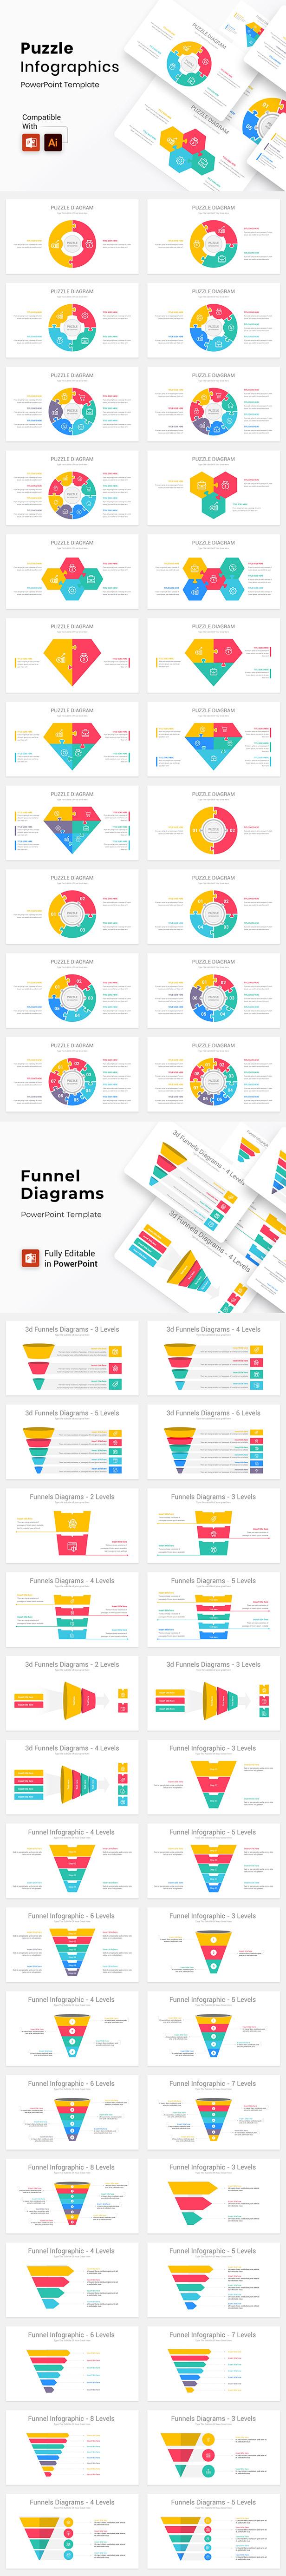 Slide Deck - Multipurpose PowerPoint Template - 4